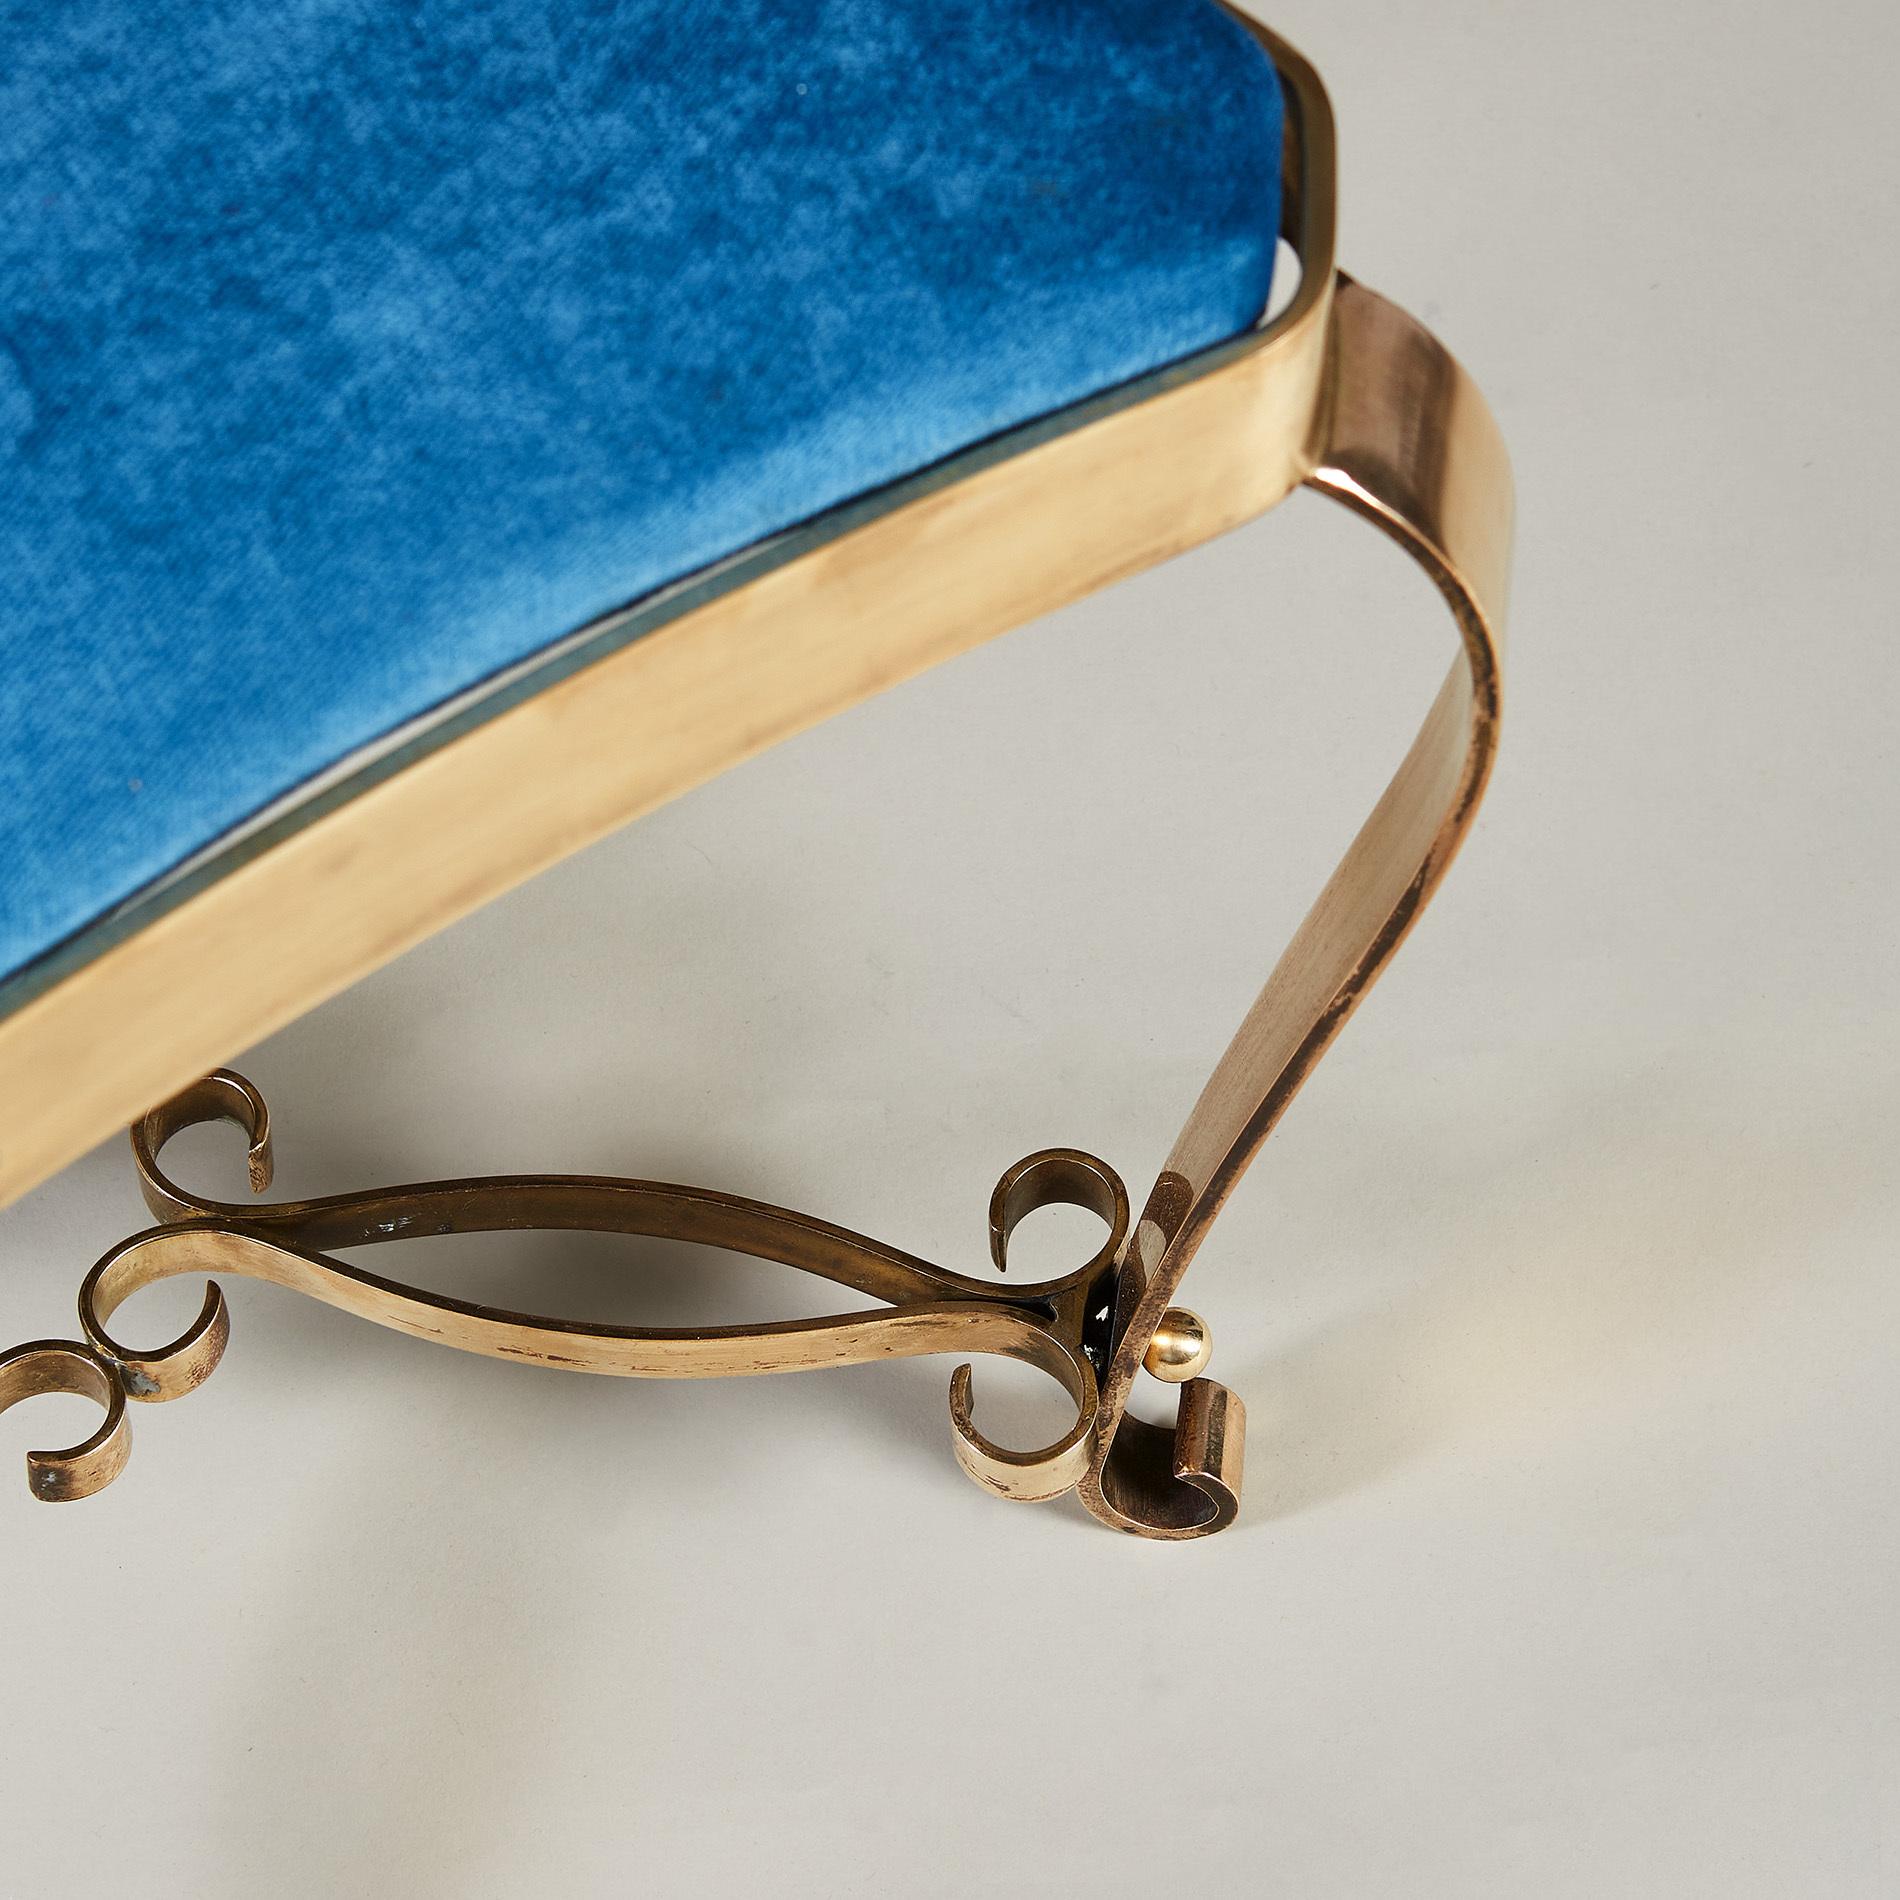 Italian Brass Stool 20210225 Valerie Wade 2 094 V1